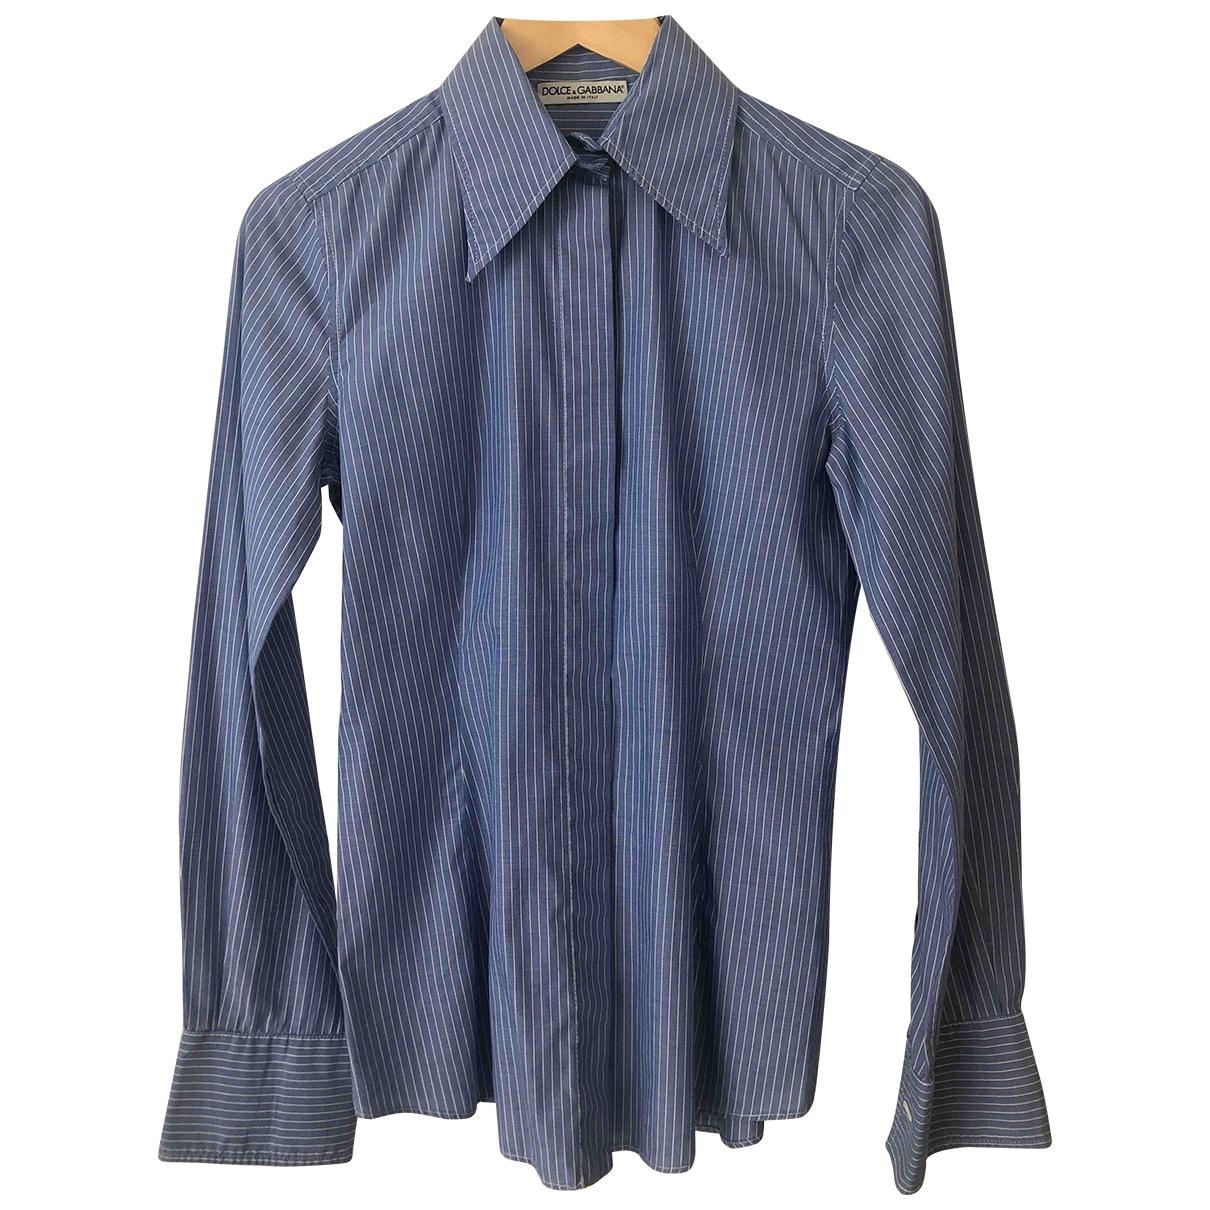 Dolce & Gabbana - Top   pour femme en coton - bleu